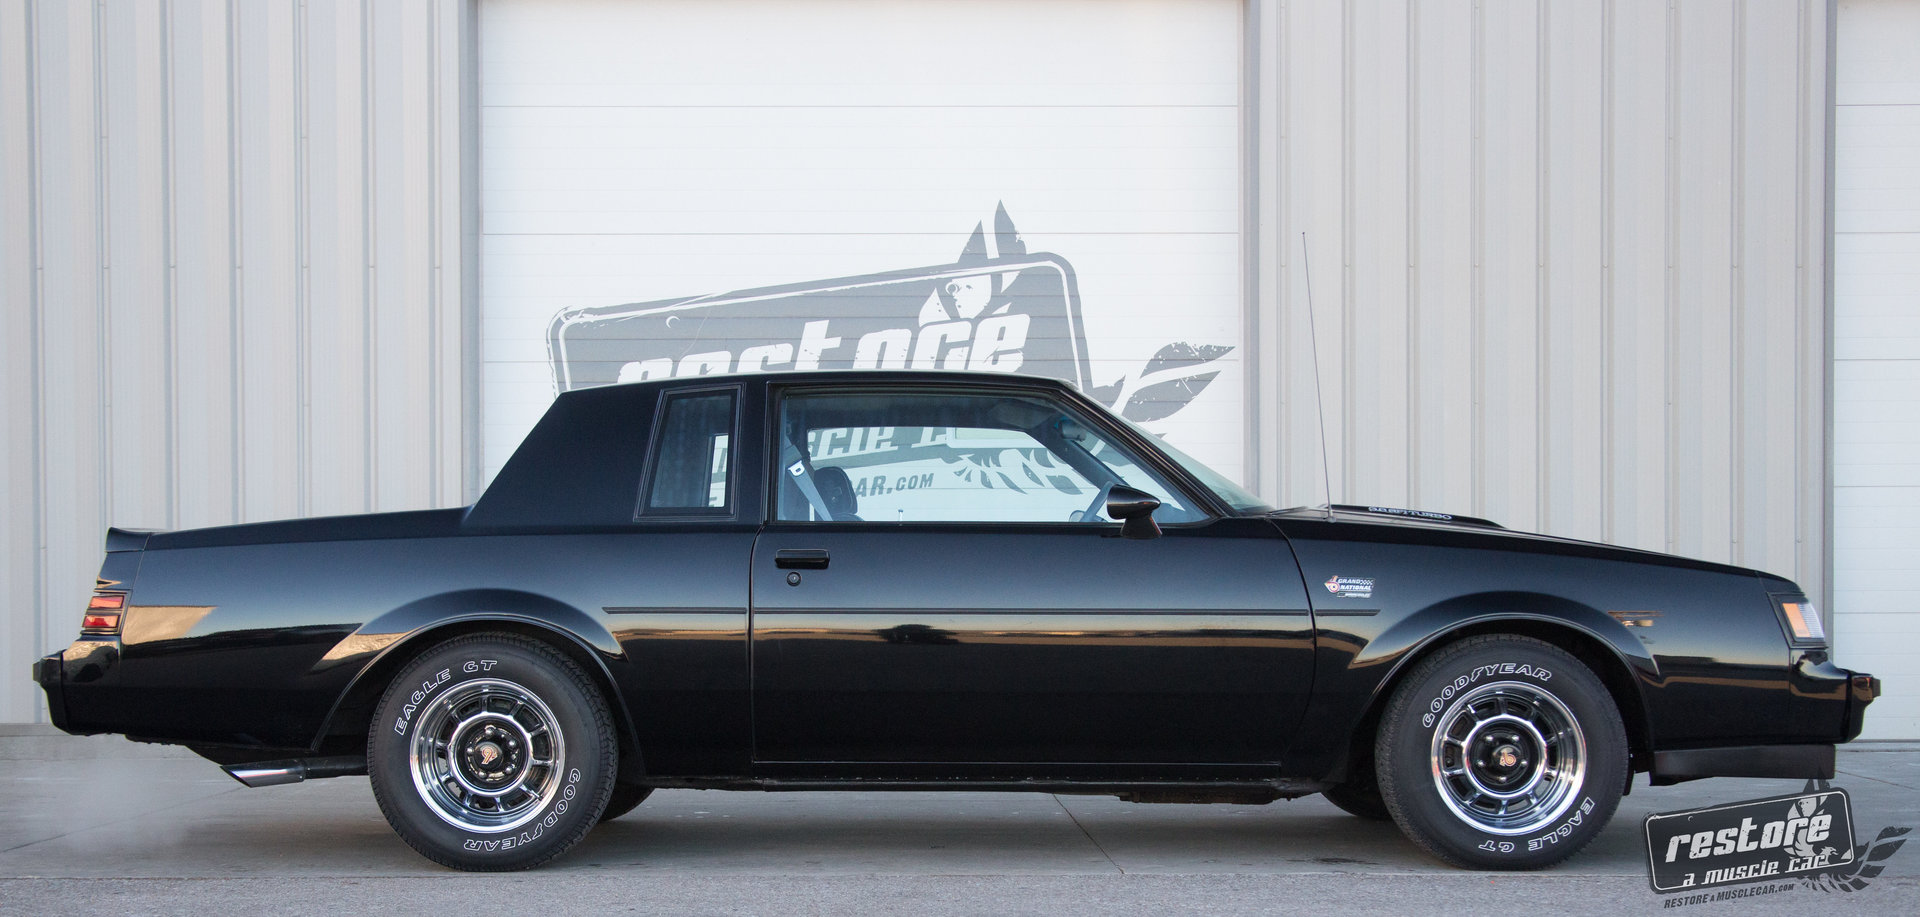 1987 Buick Grand National   Restore A Muscle Car™ LLC